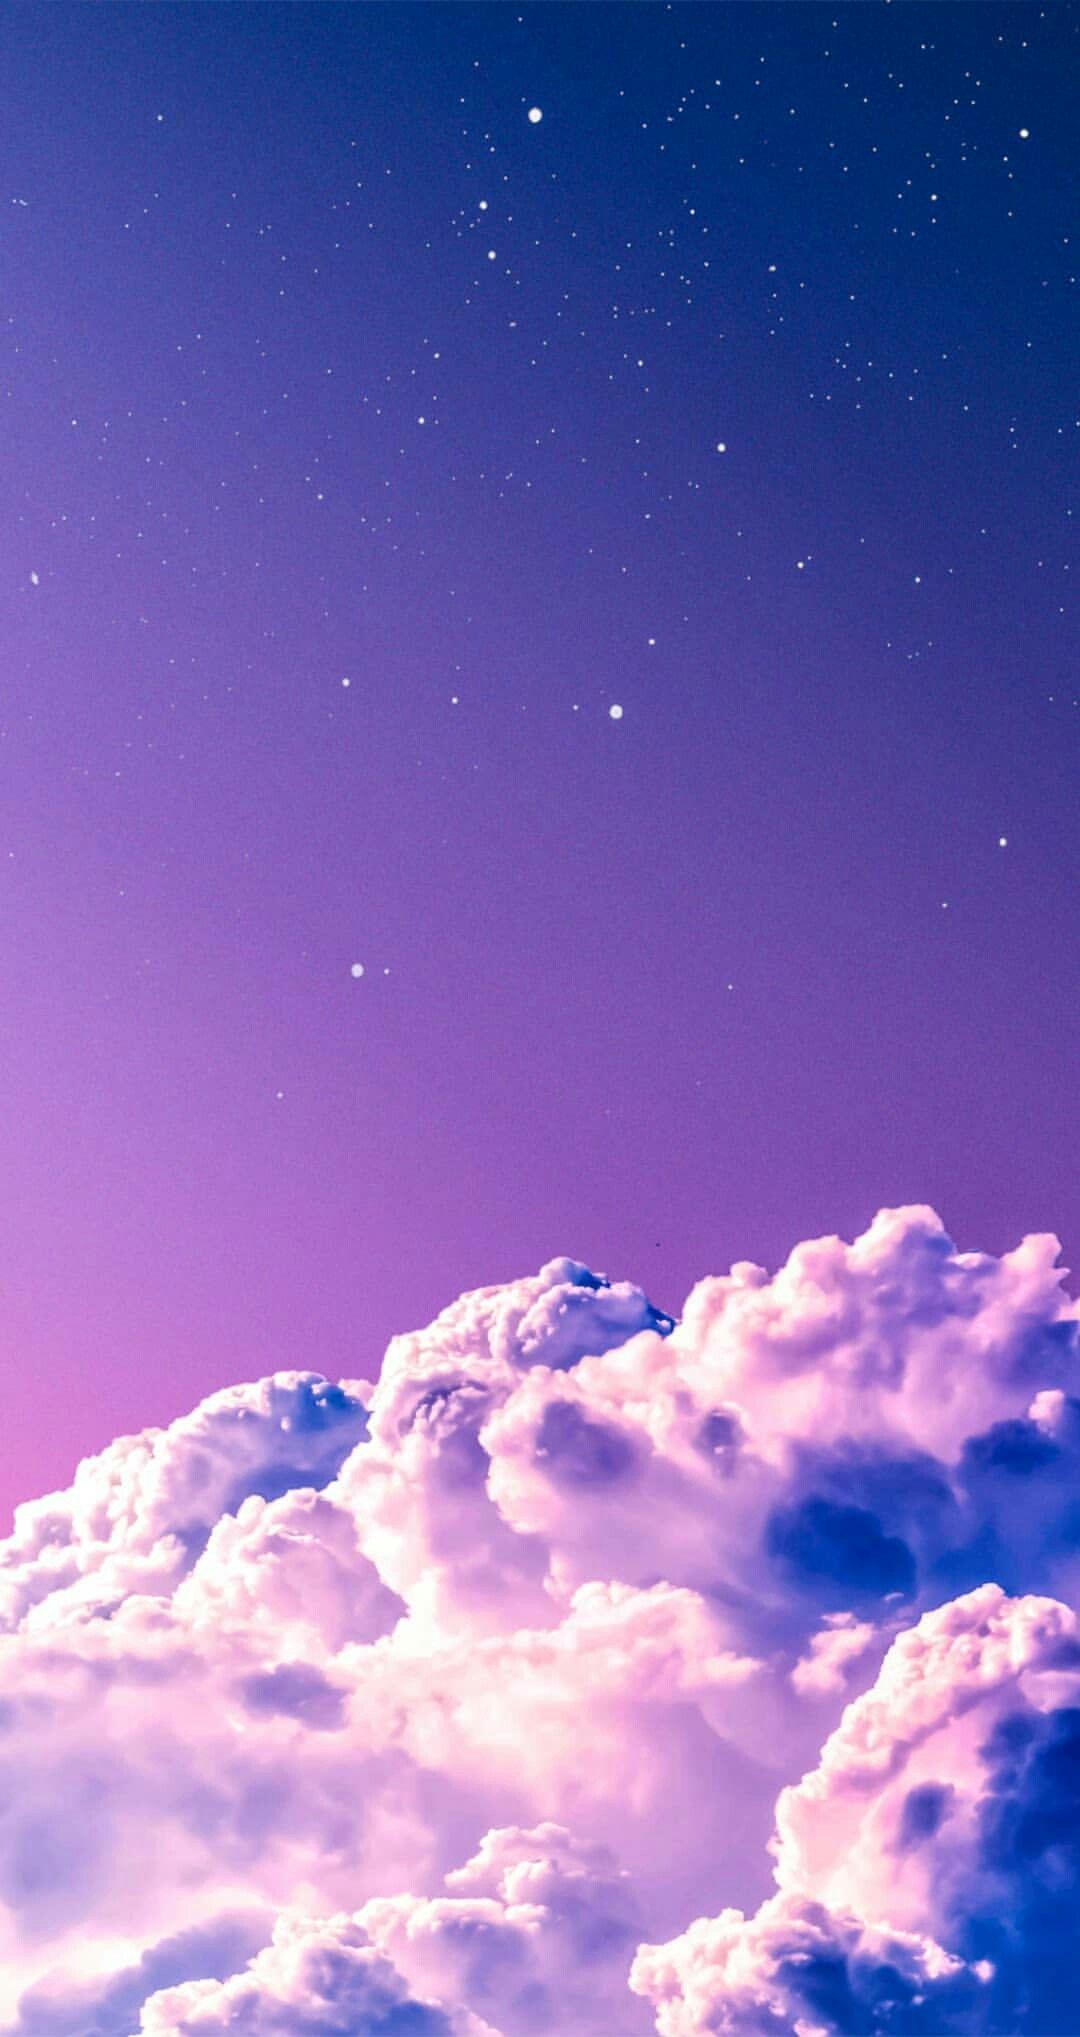 Great List of Lock Screen Iphone Purple 2020 by Uploaded by user